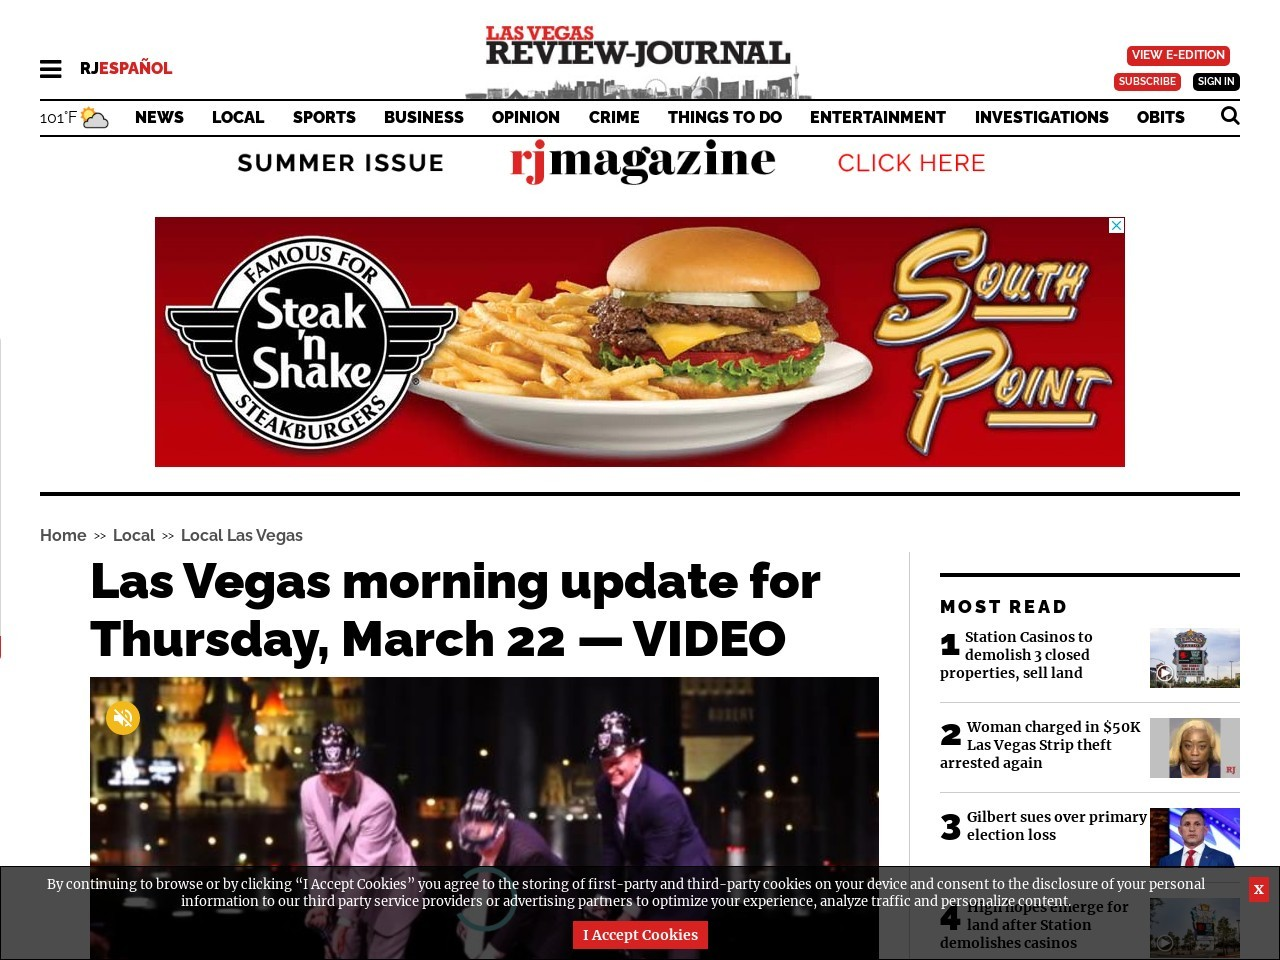 Las Vegas morning update for Thursday, March 22 — VIDEO